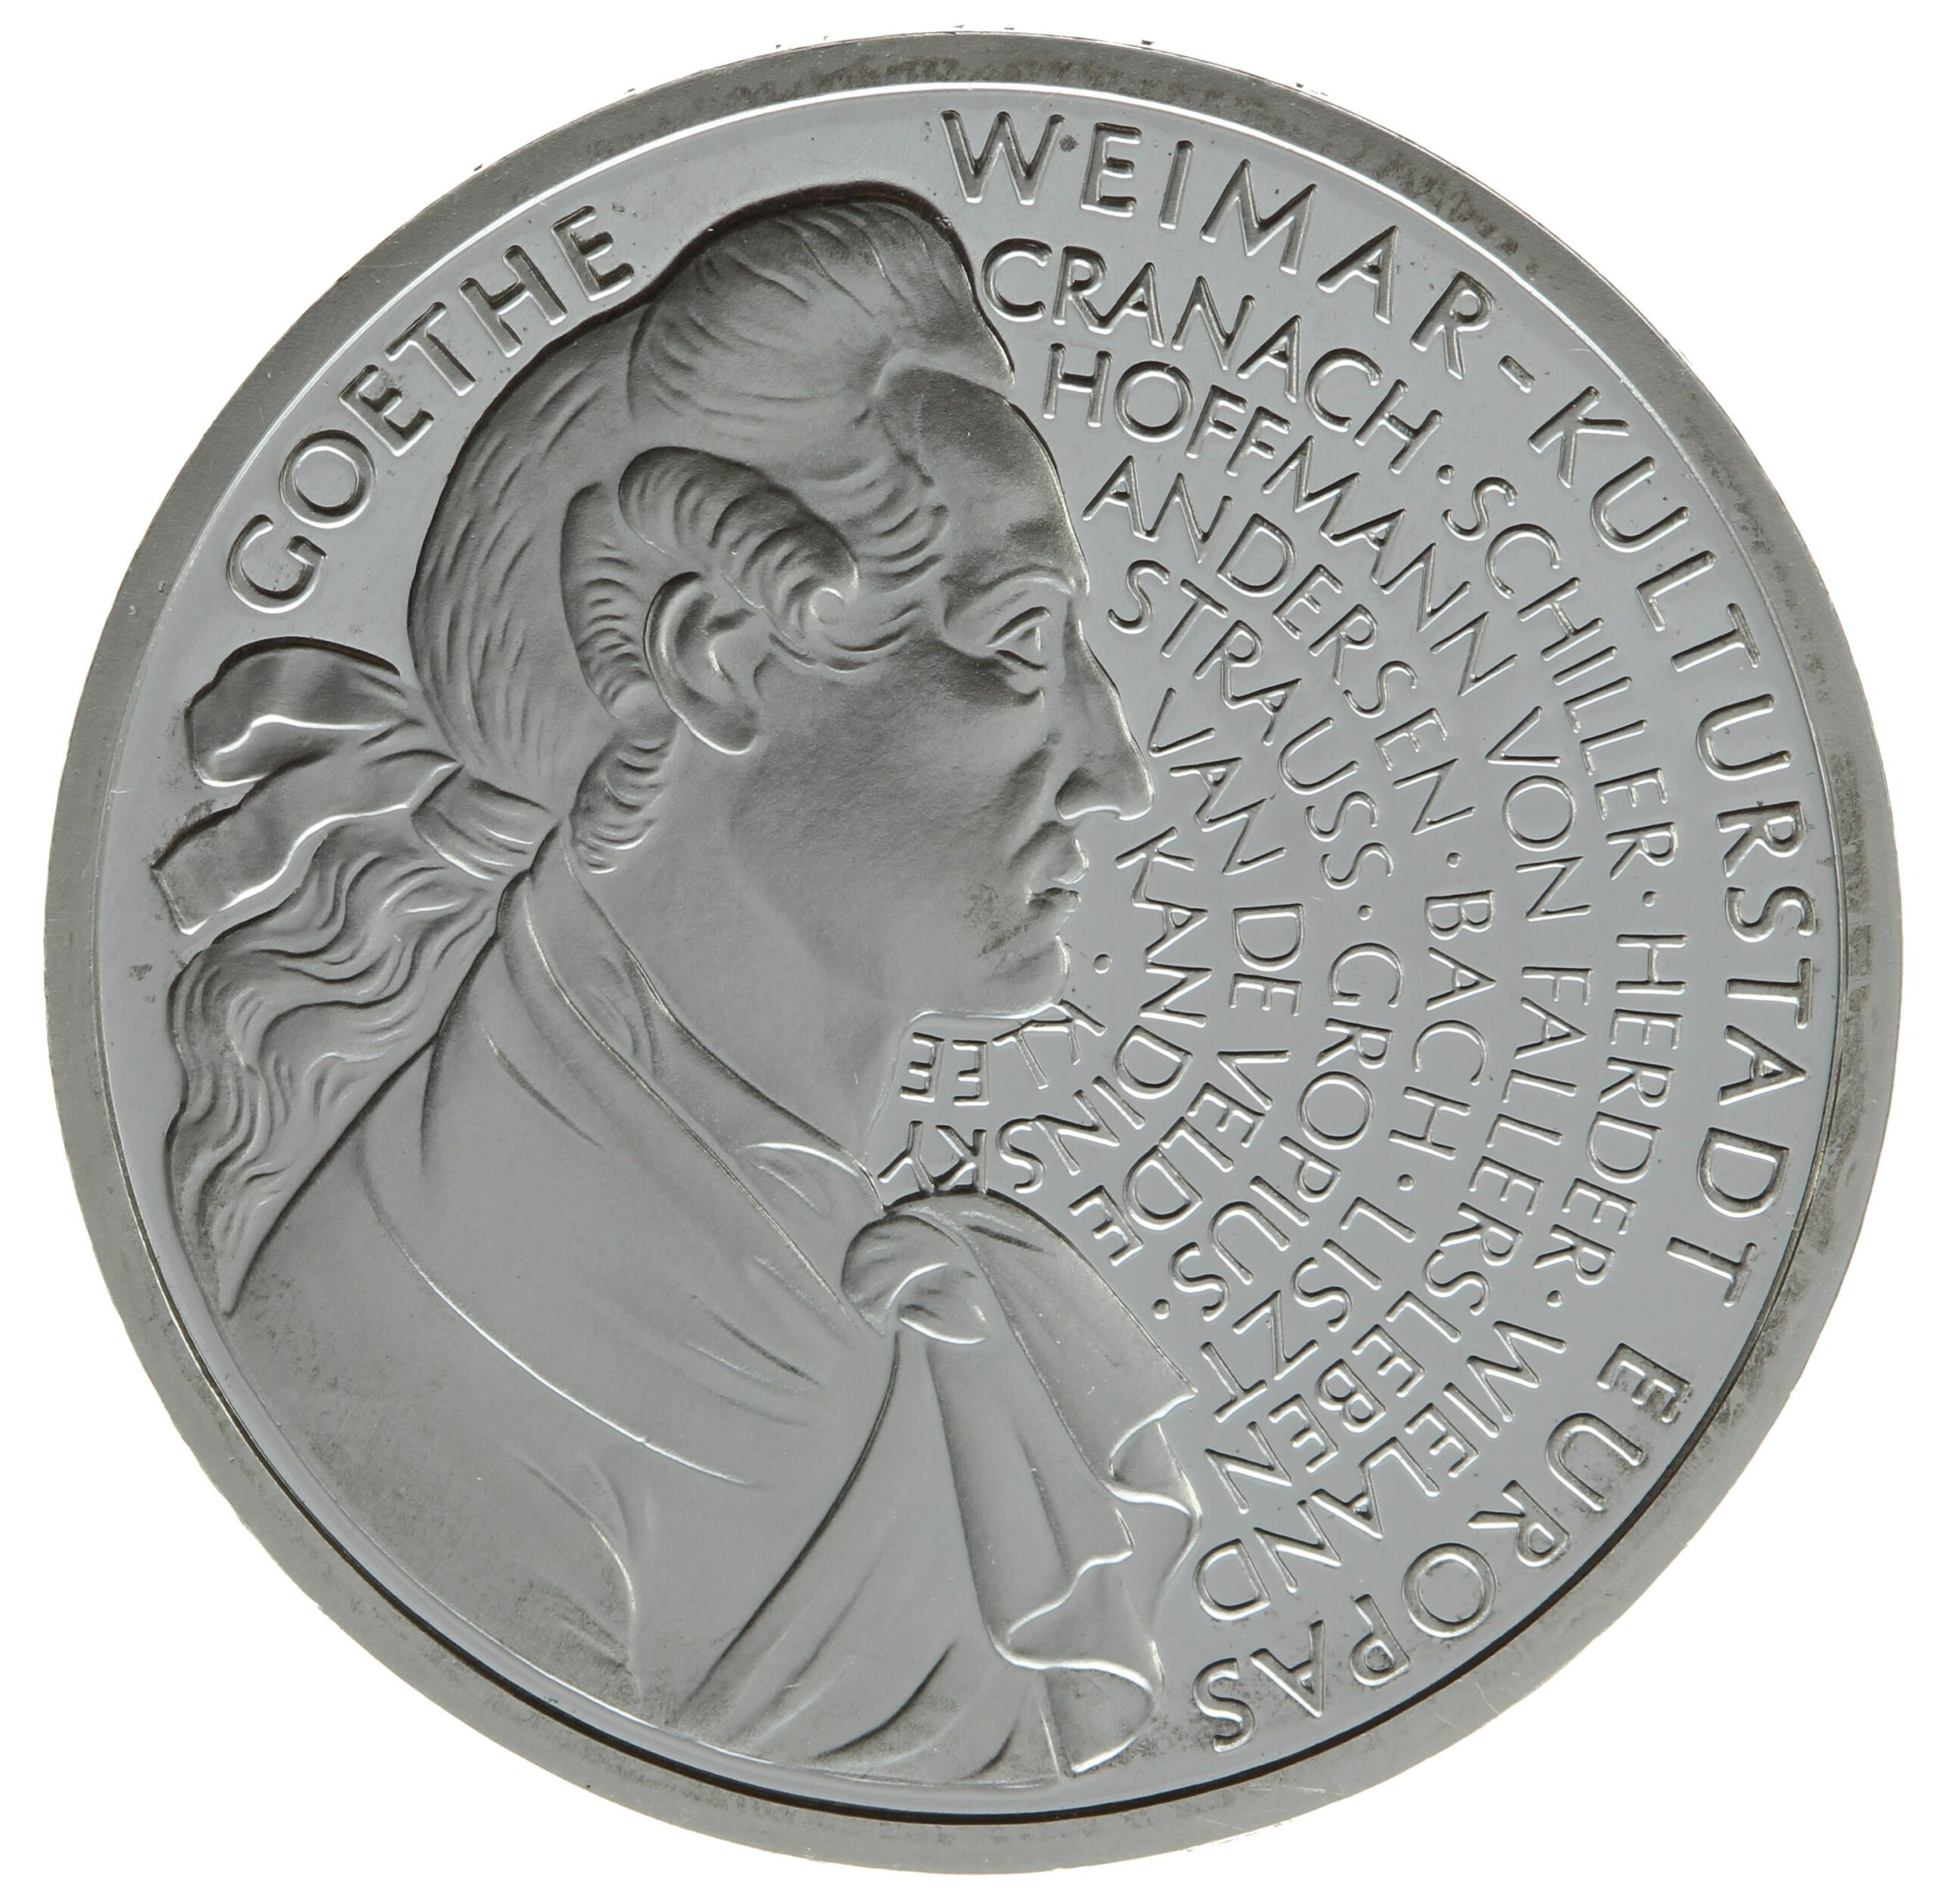 DE 10 Deutsche Mark 1999 A